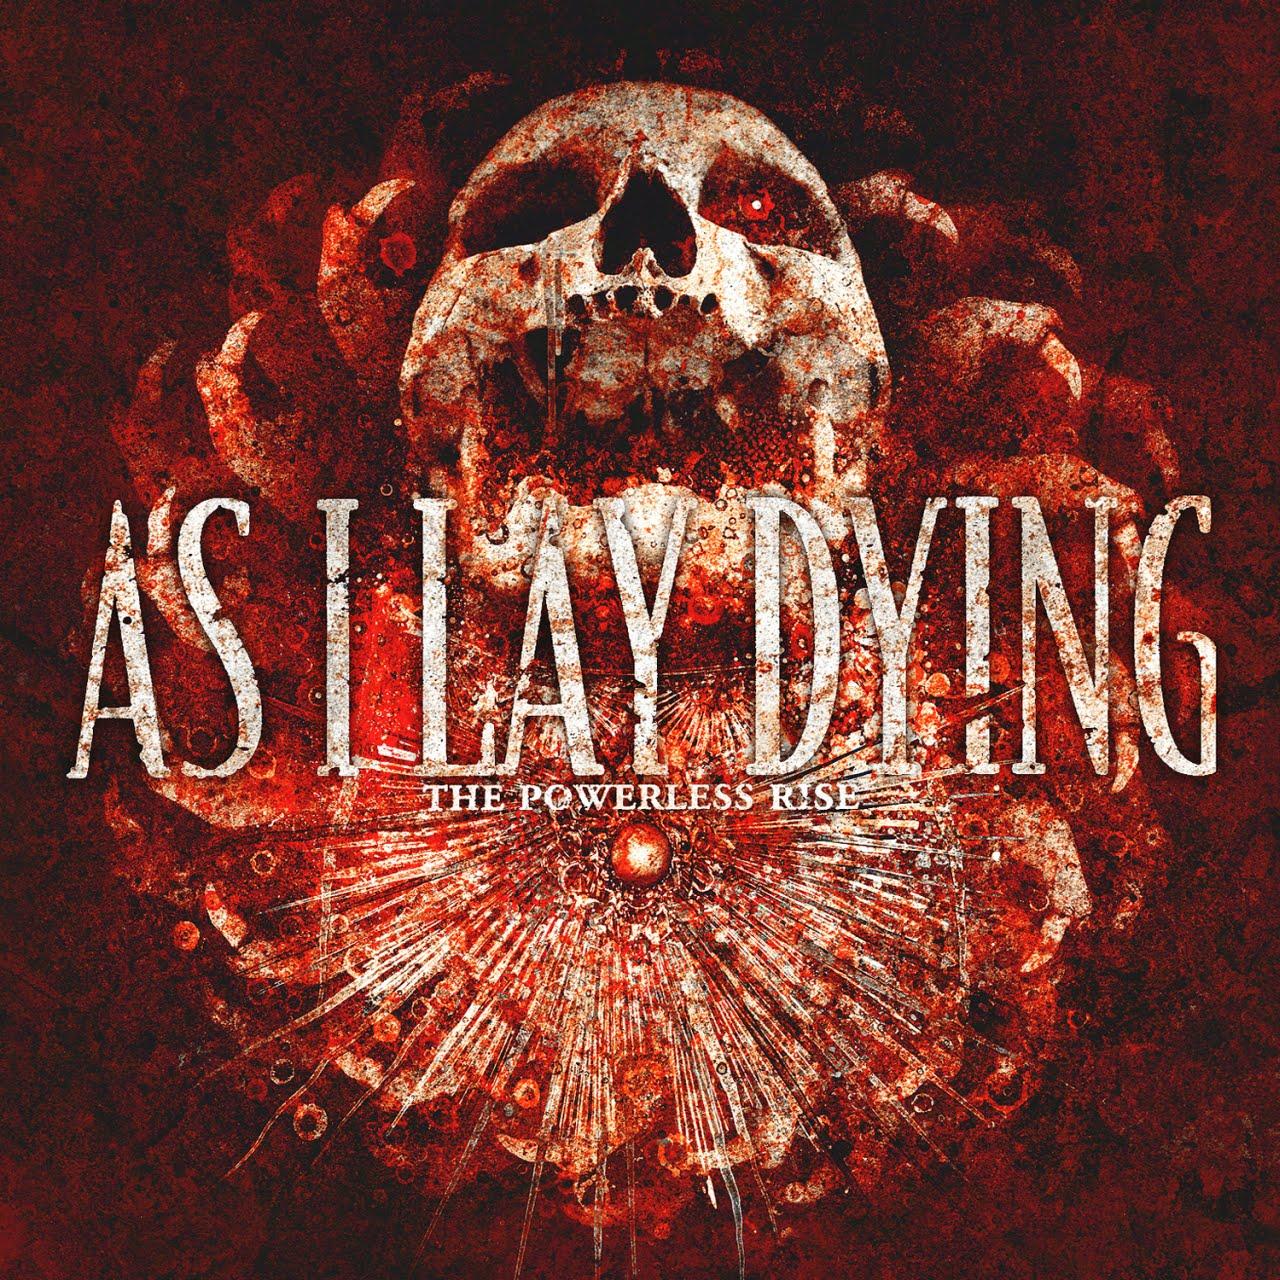 http://1.bp.blogspot.com/_0b2k2yNX8W8/TSy3BW1RgdI/AAAAAAAAAJc/mWALQod633Q/s1600/as+i+lay+dying+the+powerless+rise+2010.jpg